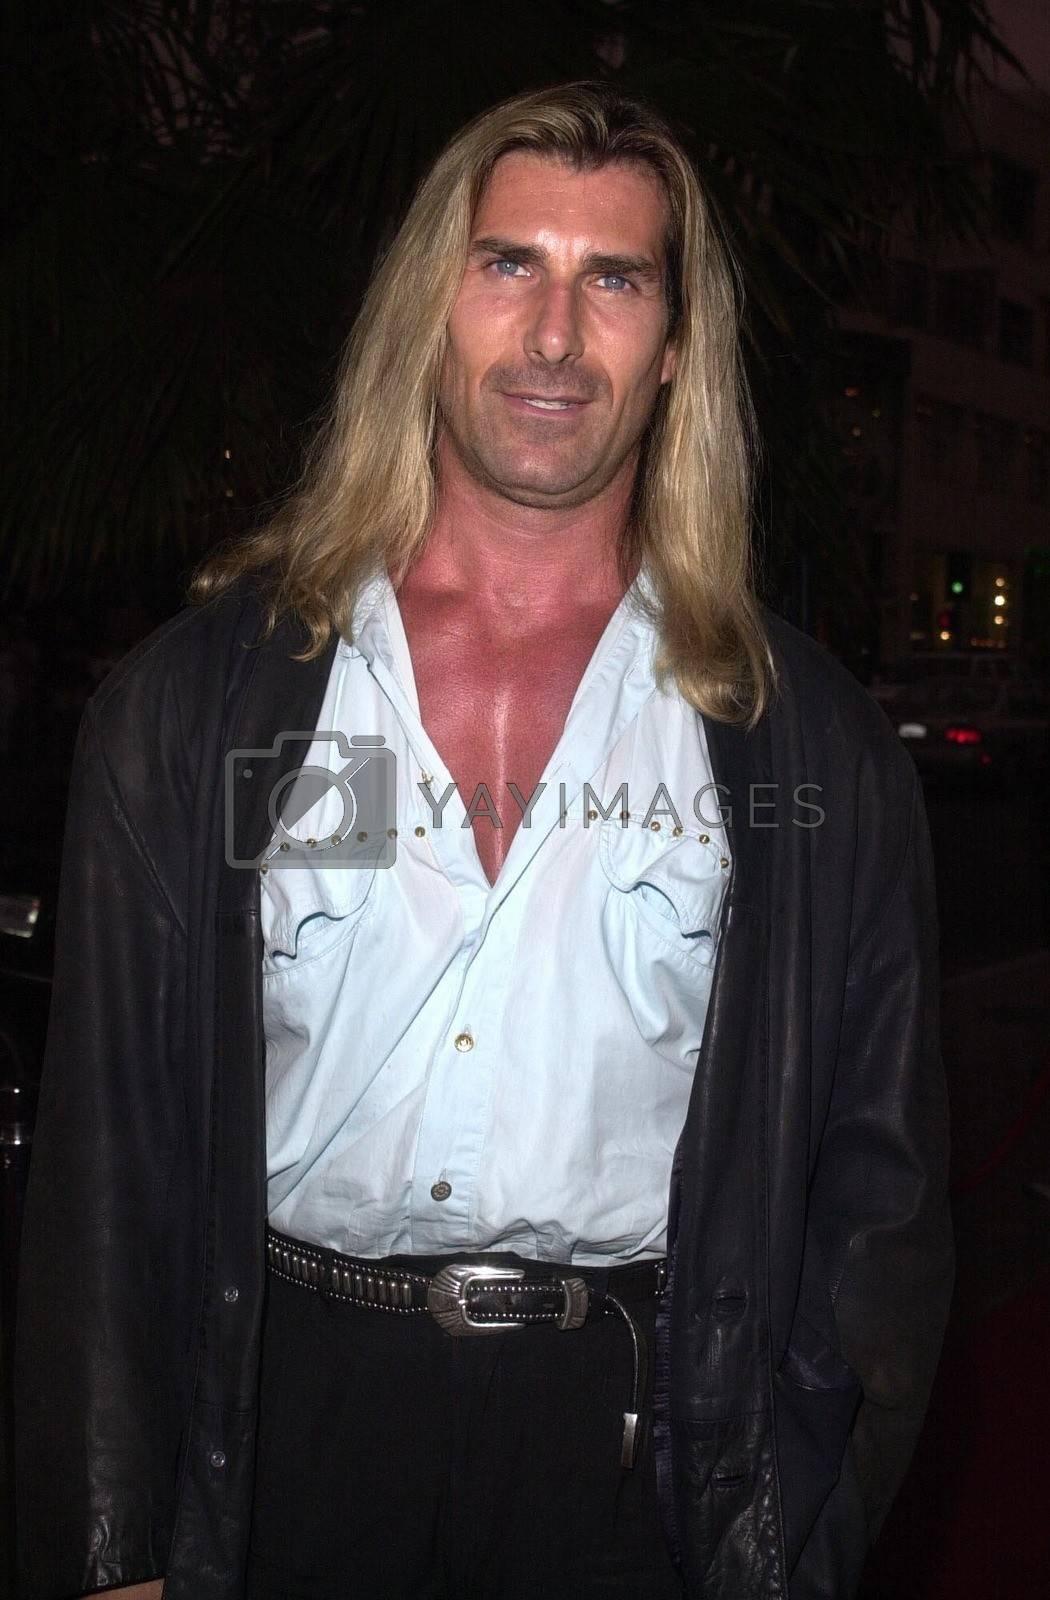 Fabio at the premiere of My 5 Wives in Santa Monica. 08-28-00